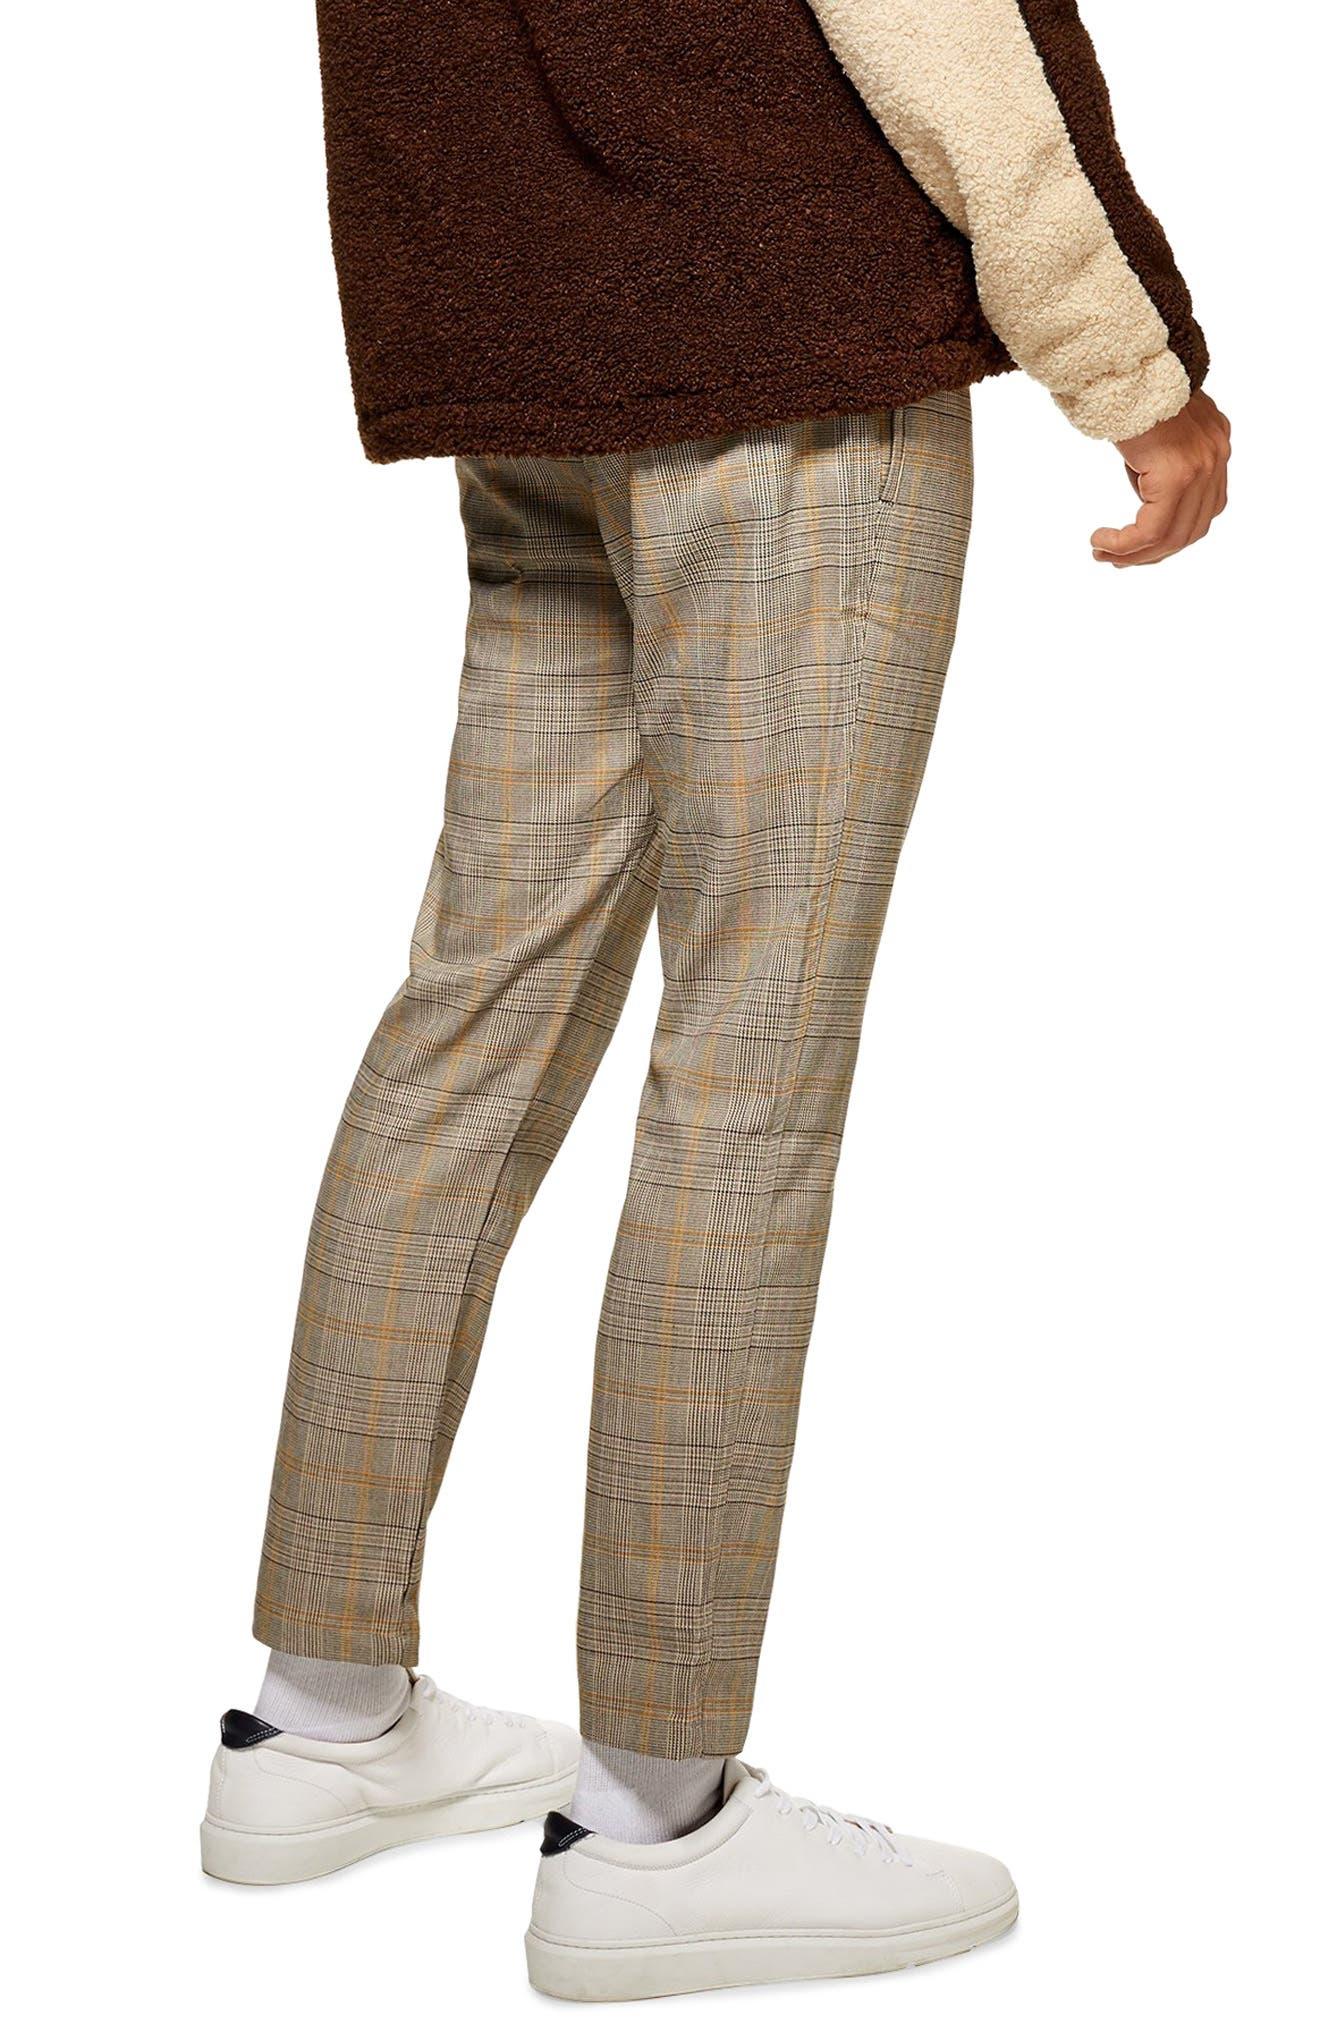 Heritage Check Jogger Pants,                             Alternate thumbnail 2, color,                             BEIGE MULTI